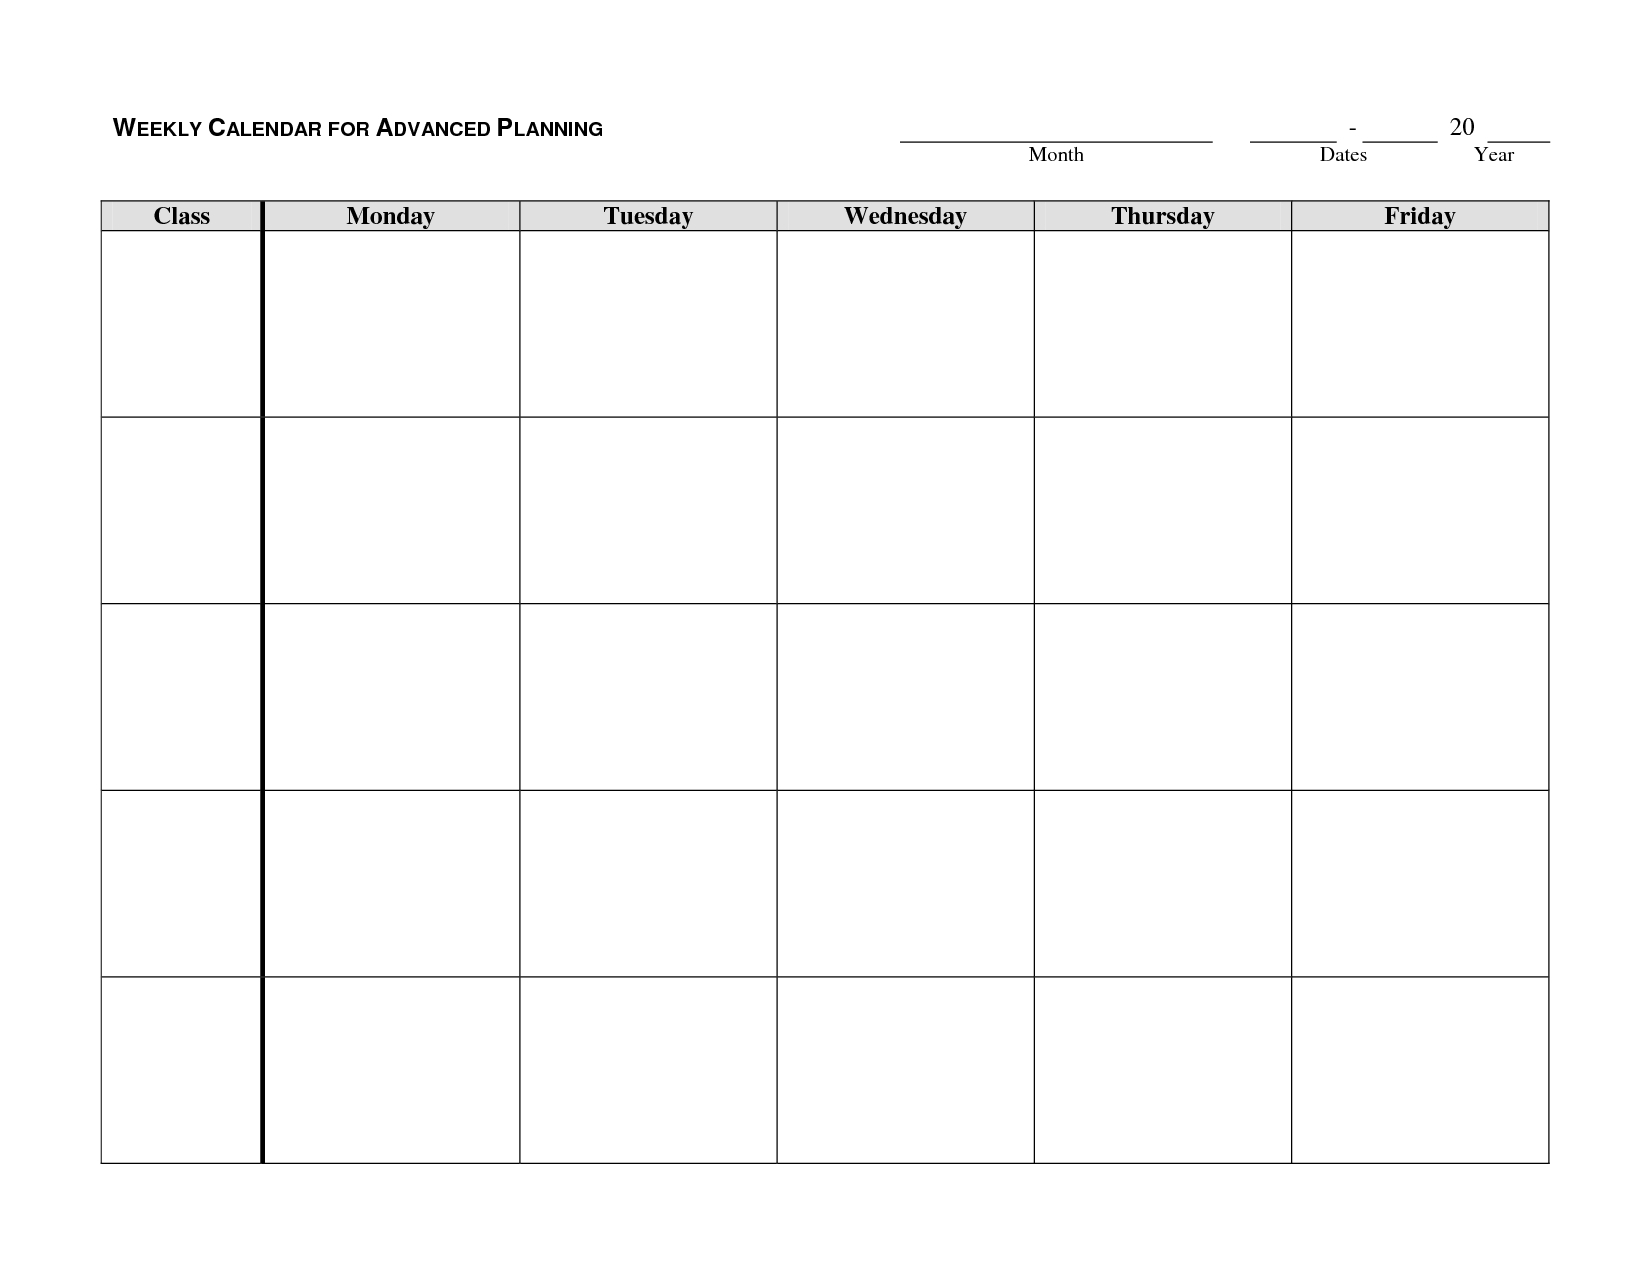 Monday Through Friday Calendar Printable Online Calendar3abry